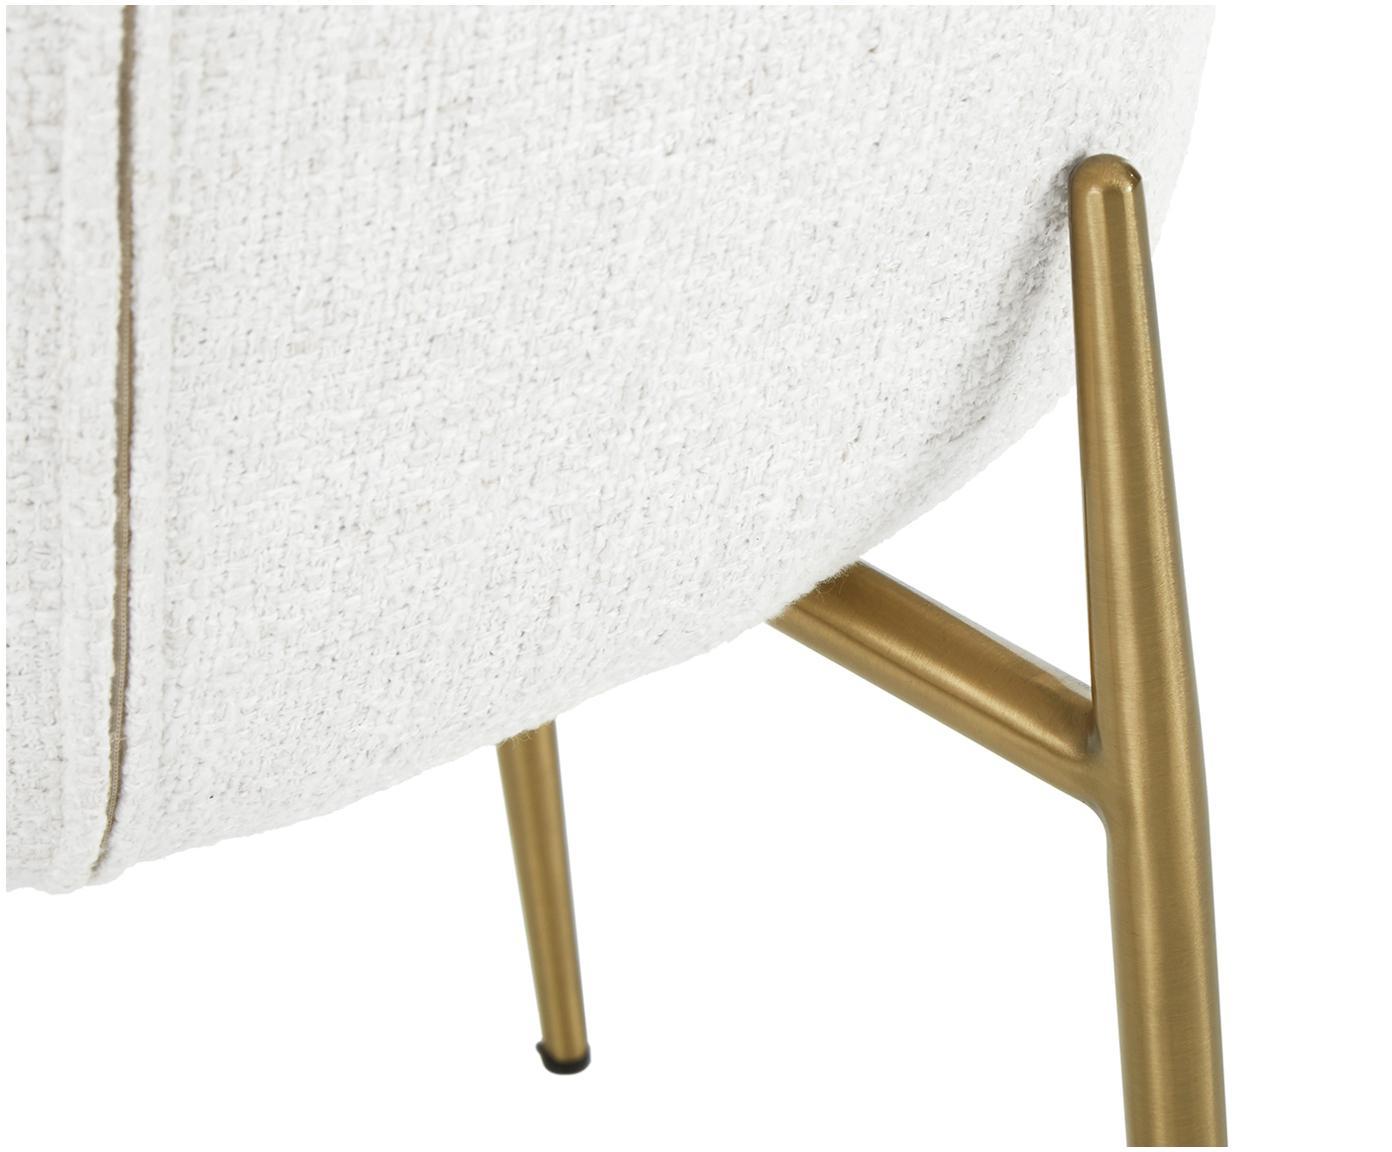 Bouclé stoel Tess, Bekleding: 70% polyester, 20% viscos, Poten: gecoat metaal, Crèmewit, B 48 x D 64 cm